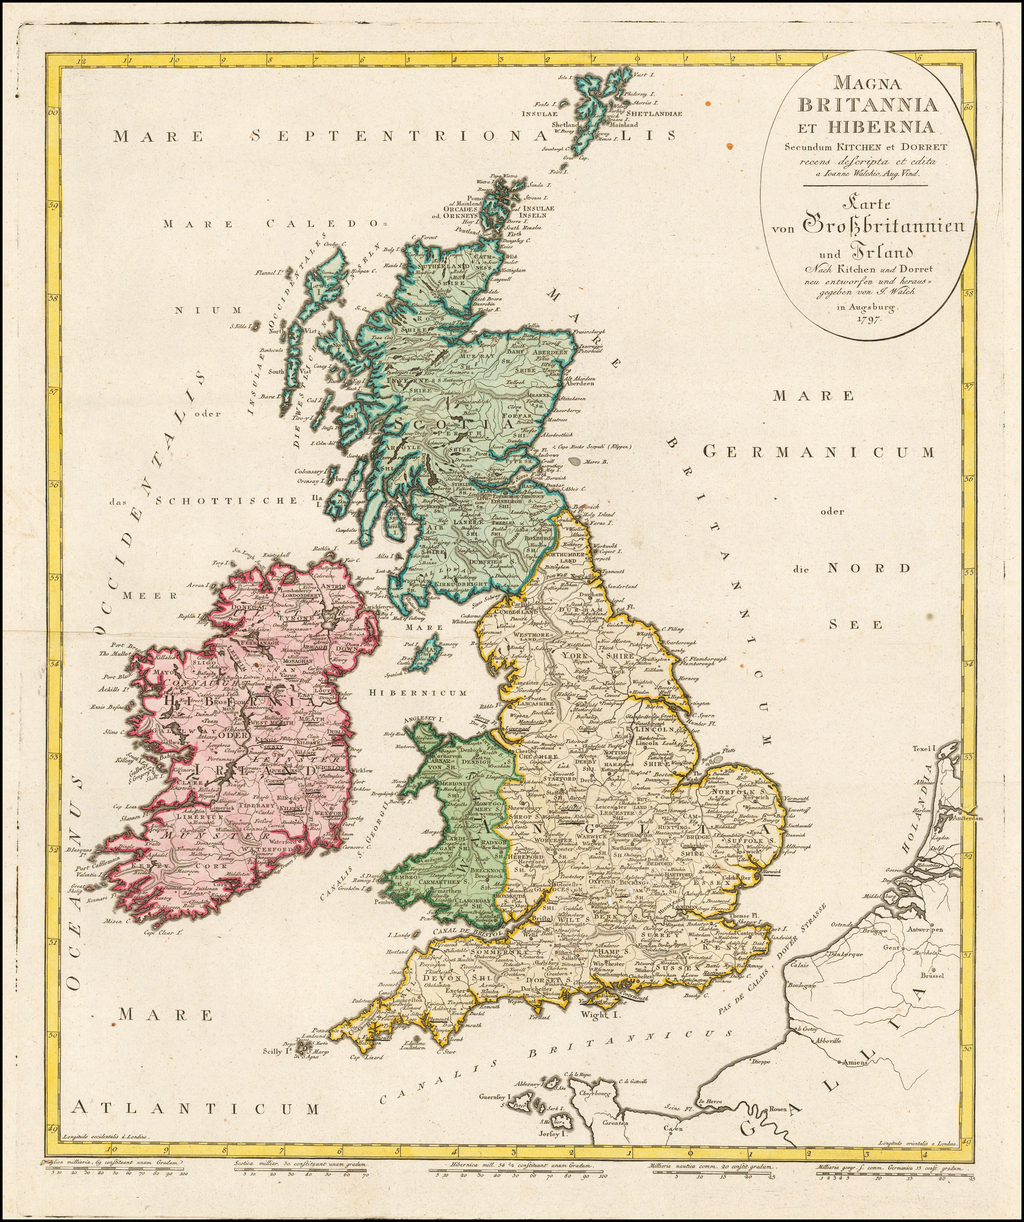 Magna Britannia Et Hibernia Secundum Kitchen et Dorrest . . . 1797 By Johann Walch